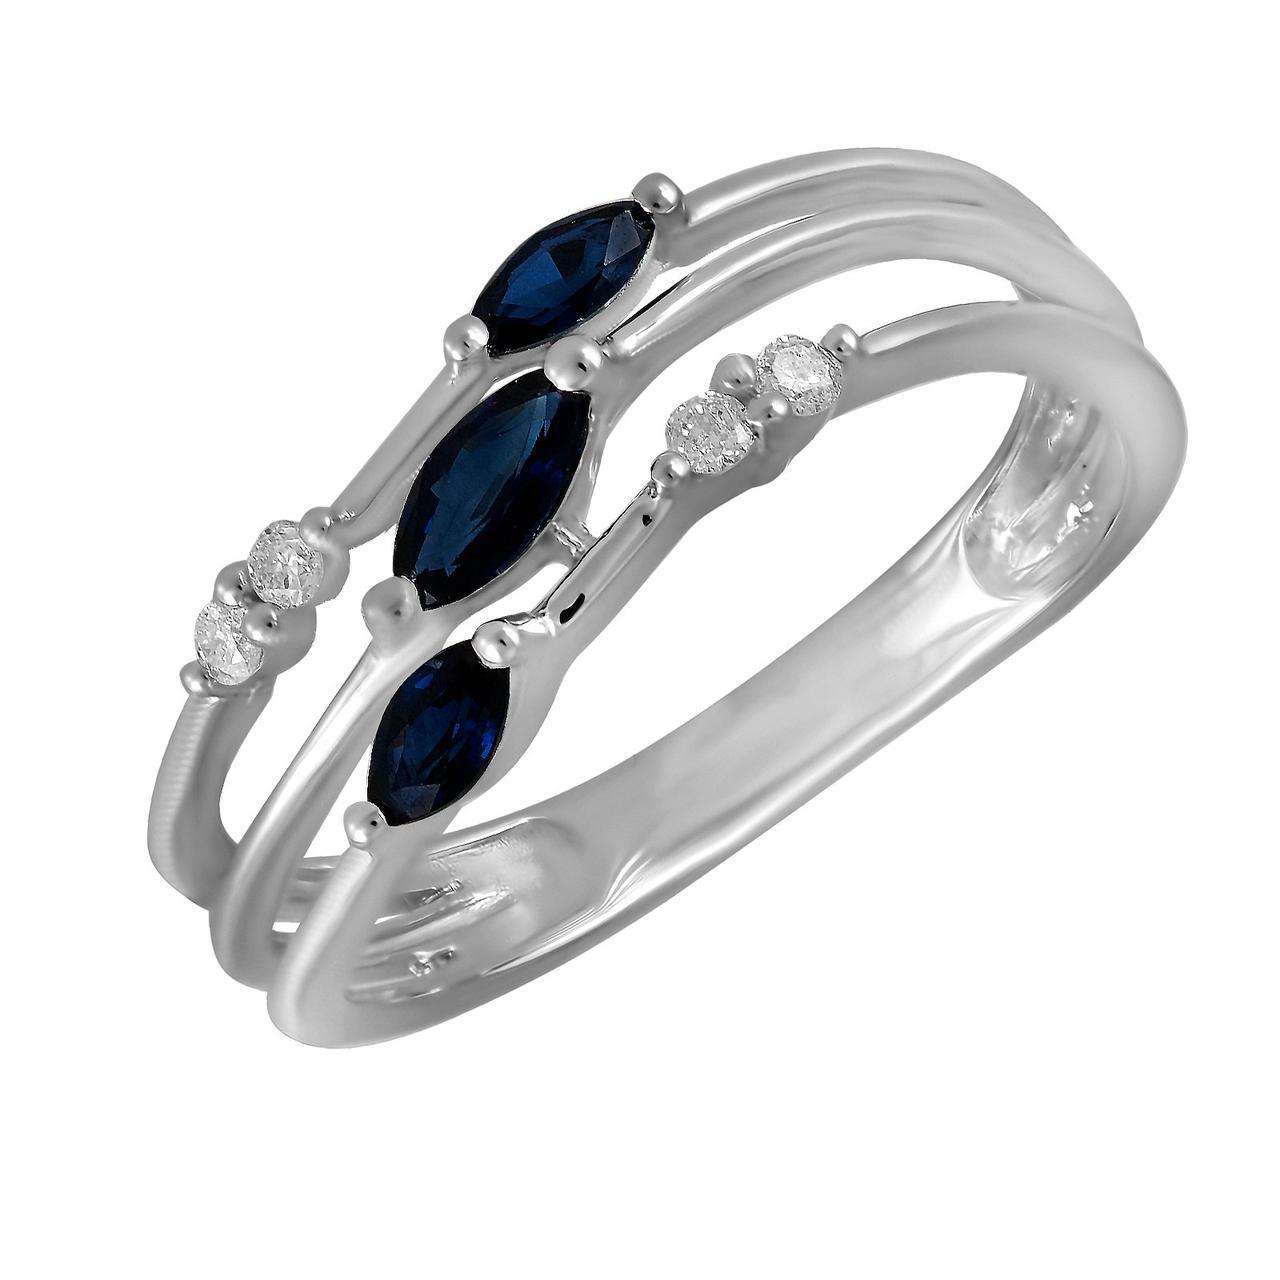 Золотое кольцо с бриллиантами и сапфирами, размер 16 (228823)